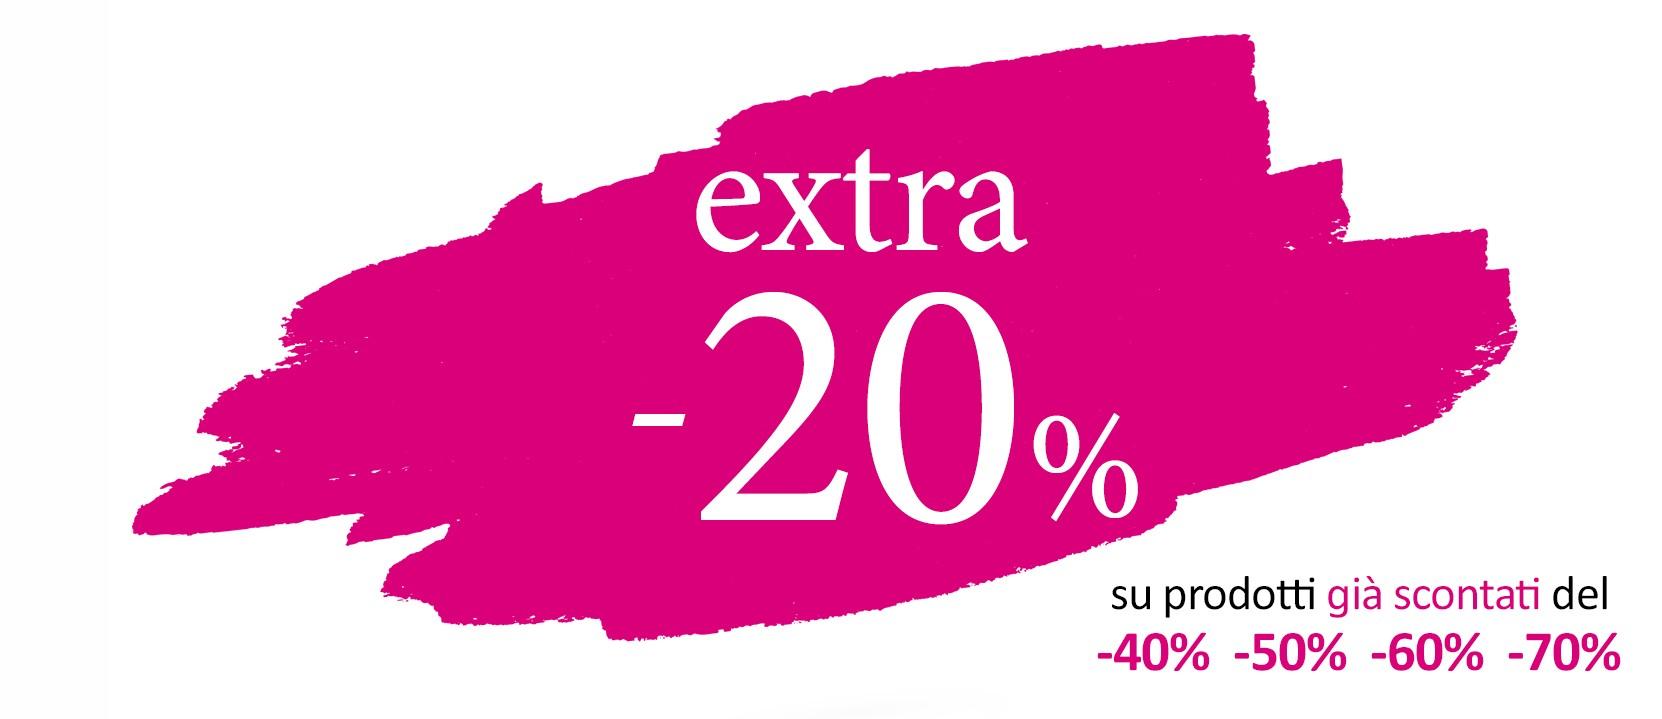 Ritorna l'EXTRA -20%